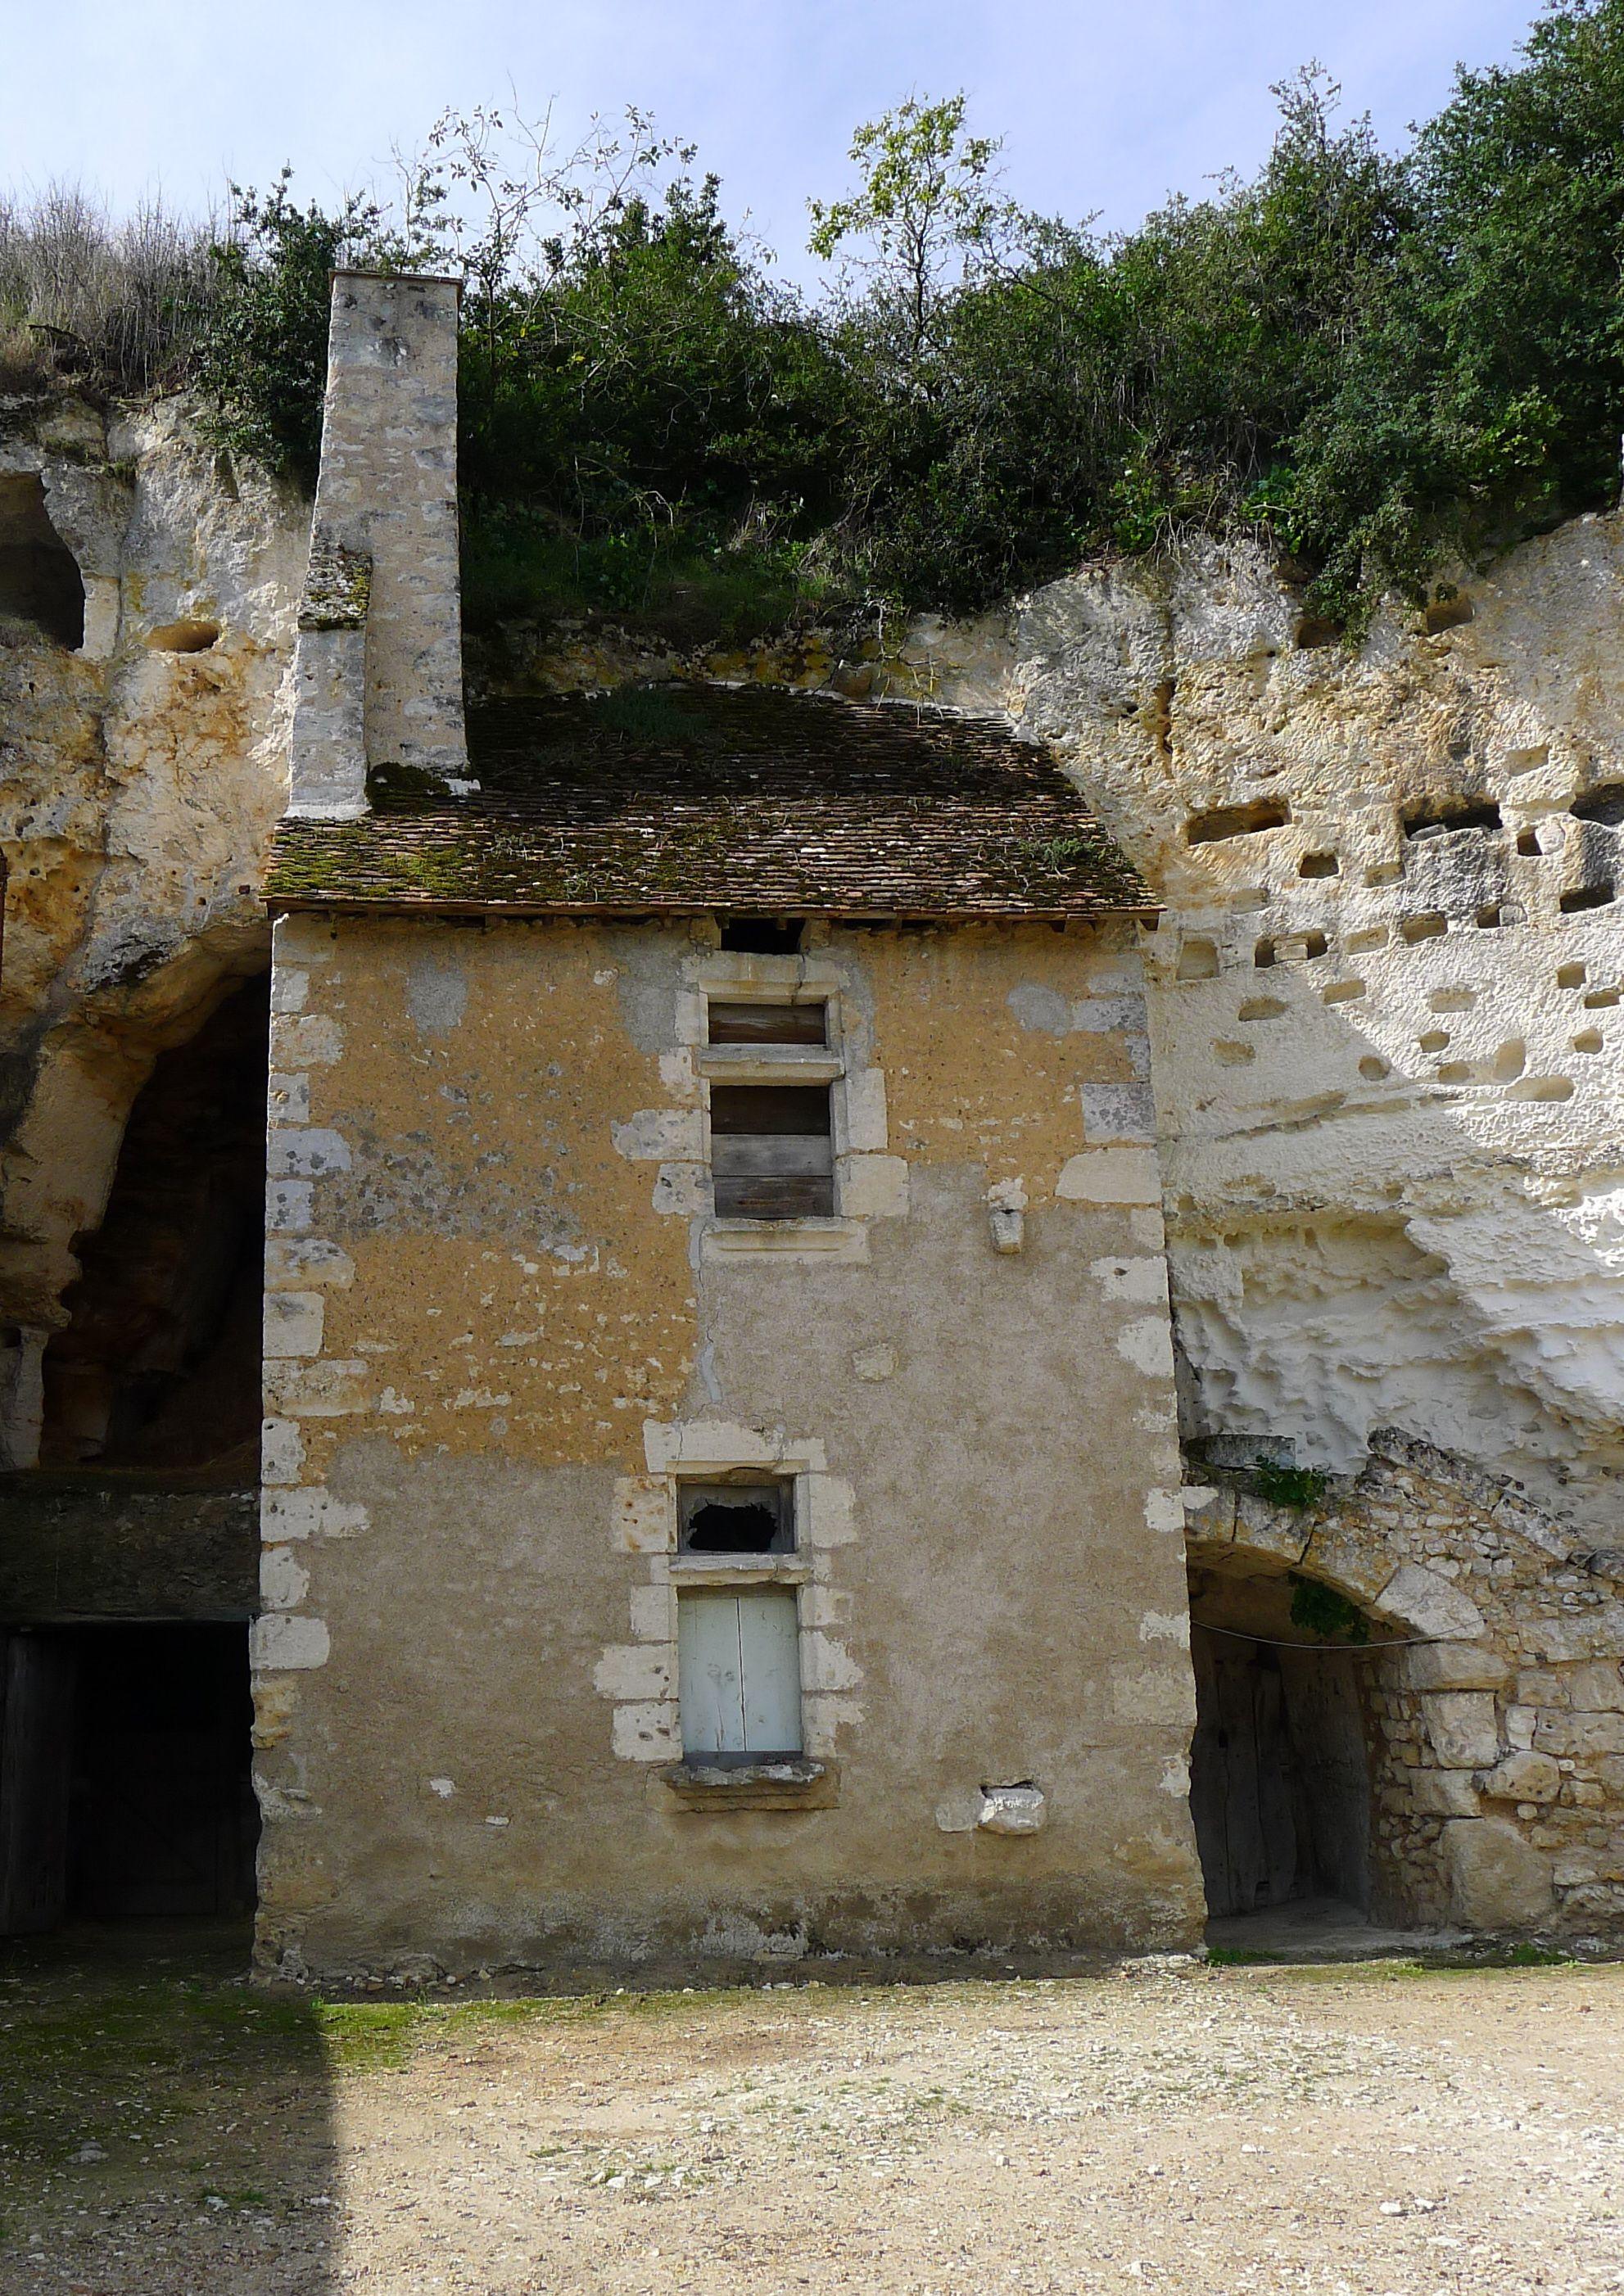 Abris lotois France Vernacular house Europe